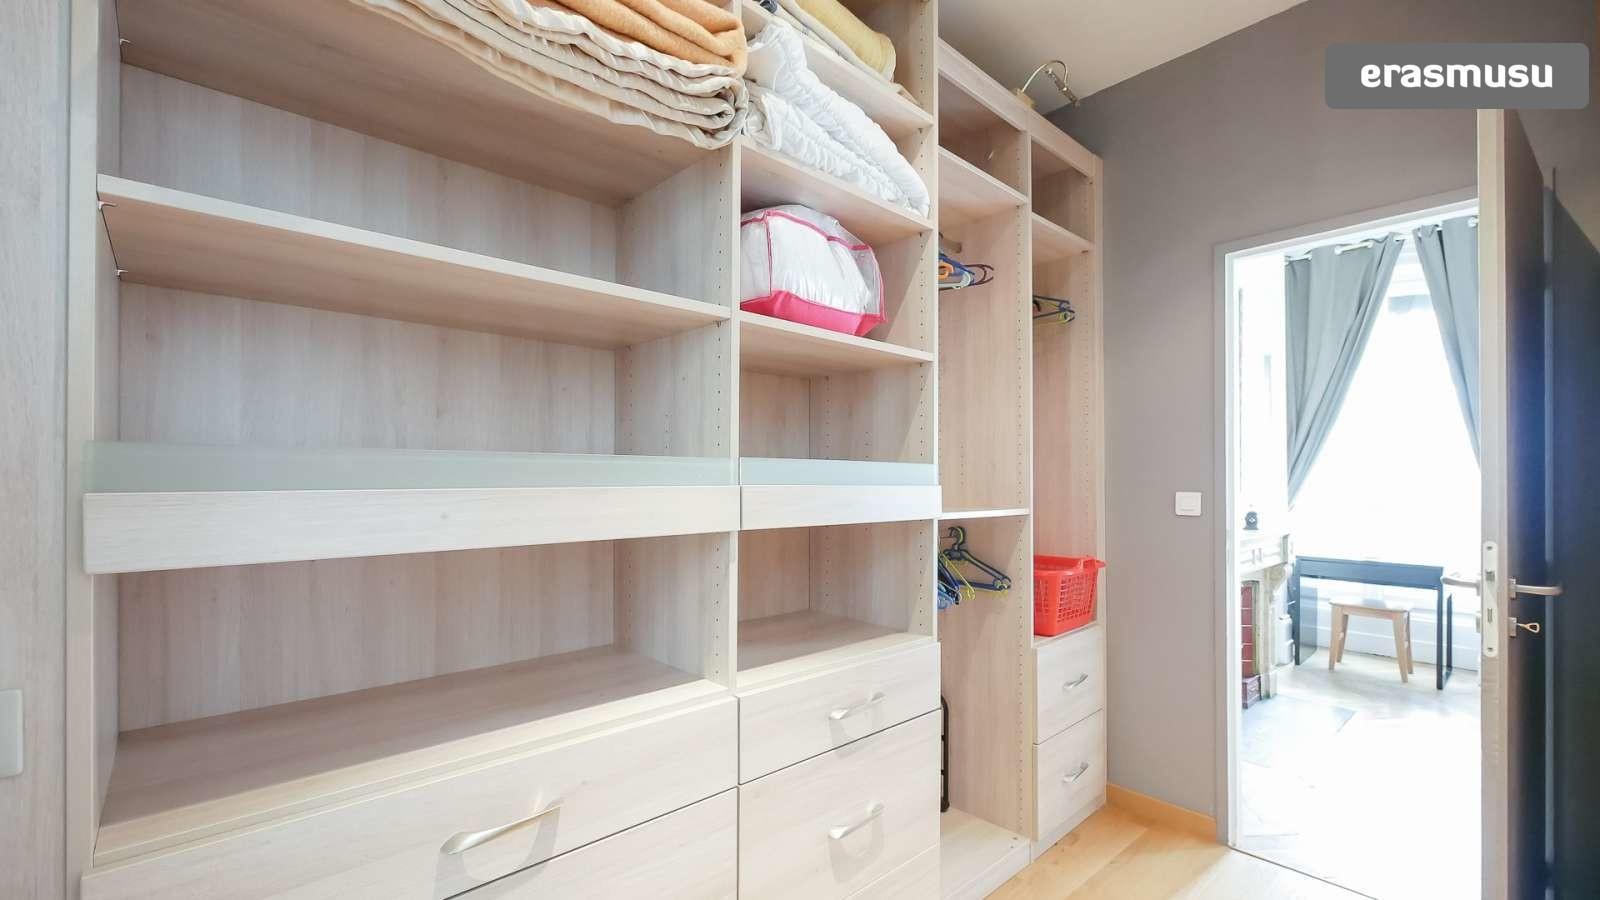 spacious-2-bedroom-apartment-rent-cordeliers-dc472de81fce5bc81b4